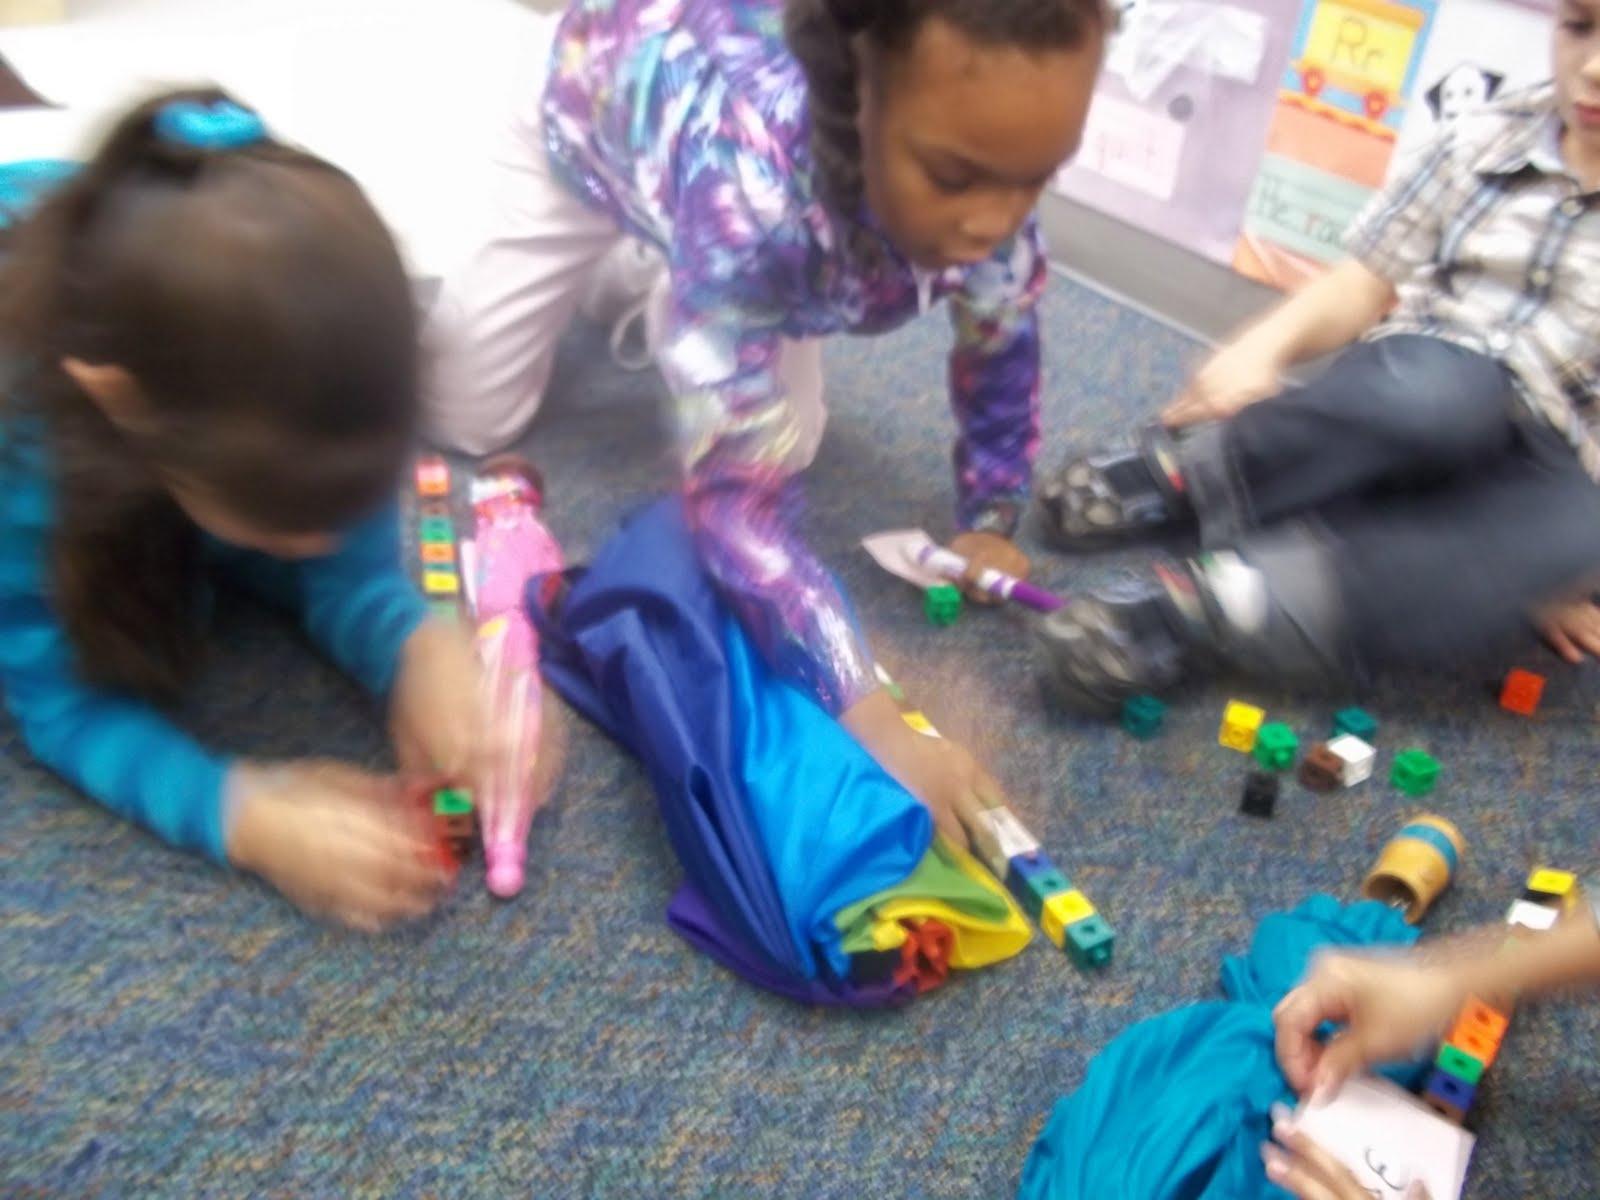 Kinder Garden: Mrs. Wood's Kindergarten Class: Umbrella Day